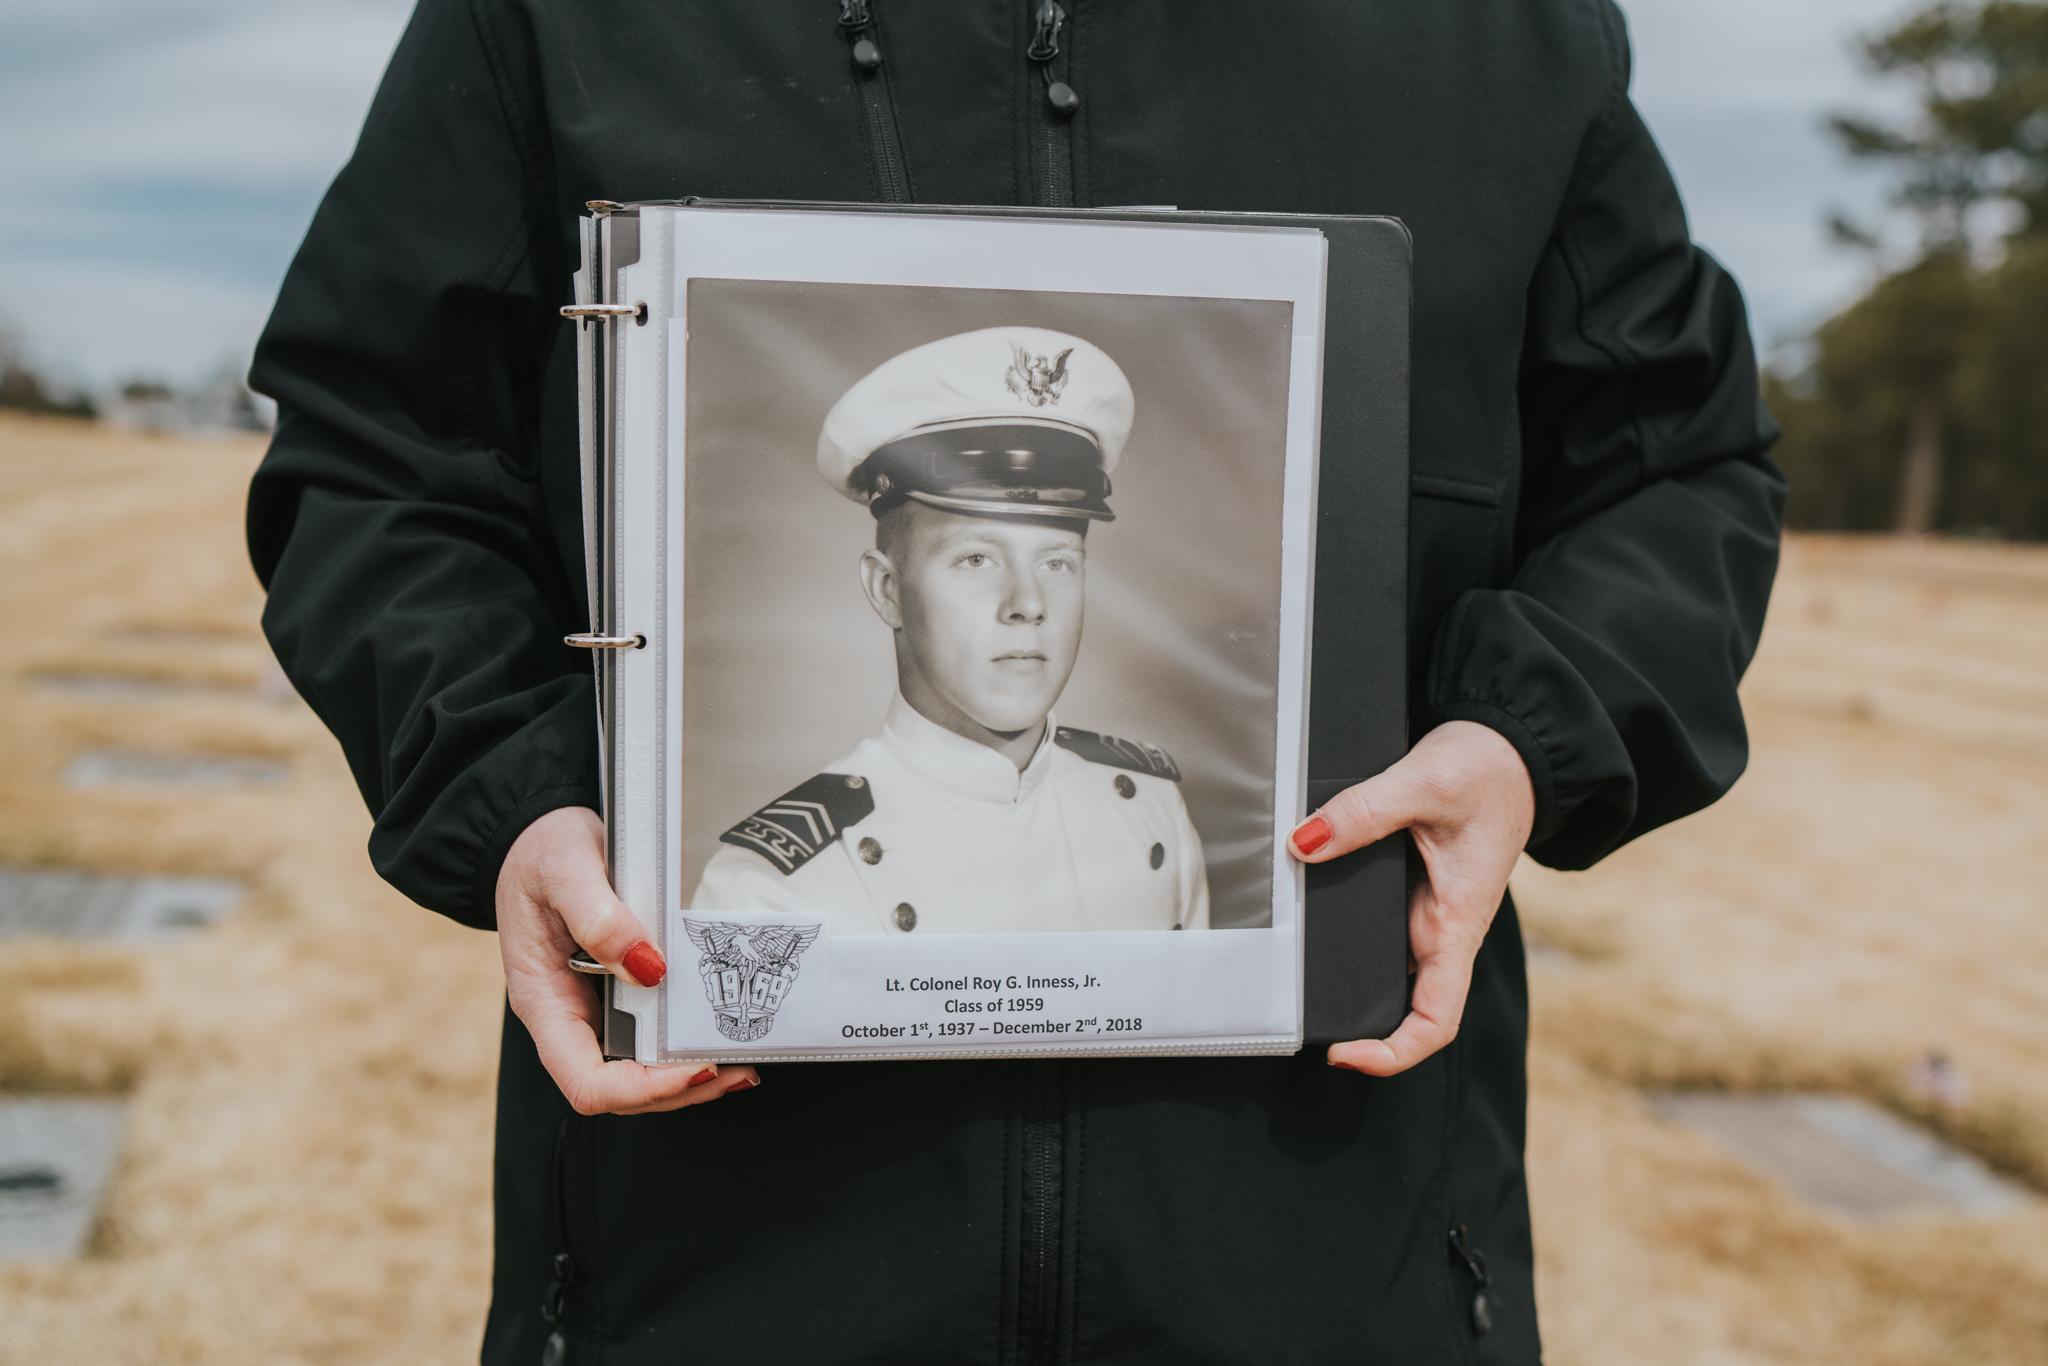 usafa-colorado-military-honours-burial-funeral-photography-grace-elizabeth-colchester-essex-alternative-wedding-lifestyle-photographer (117 of 127).jpg